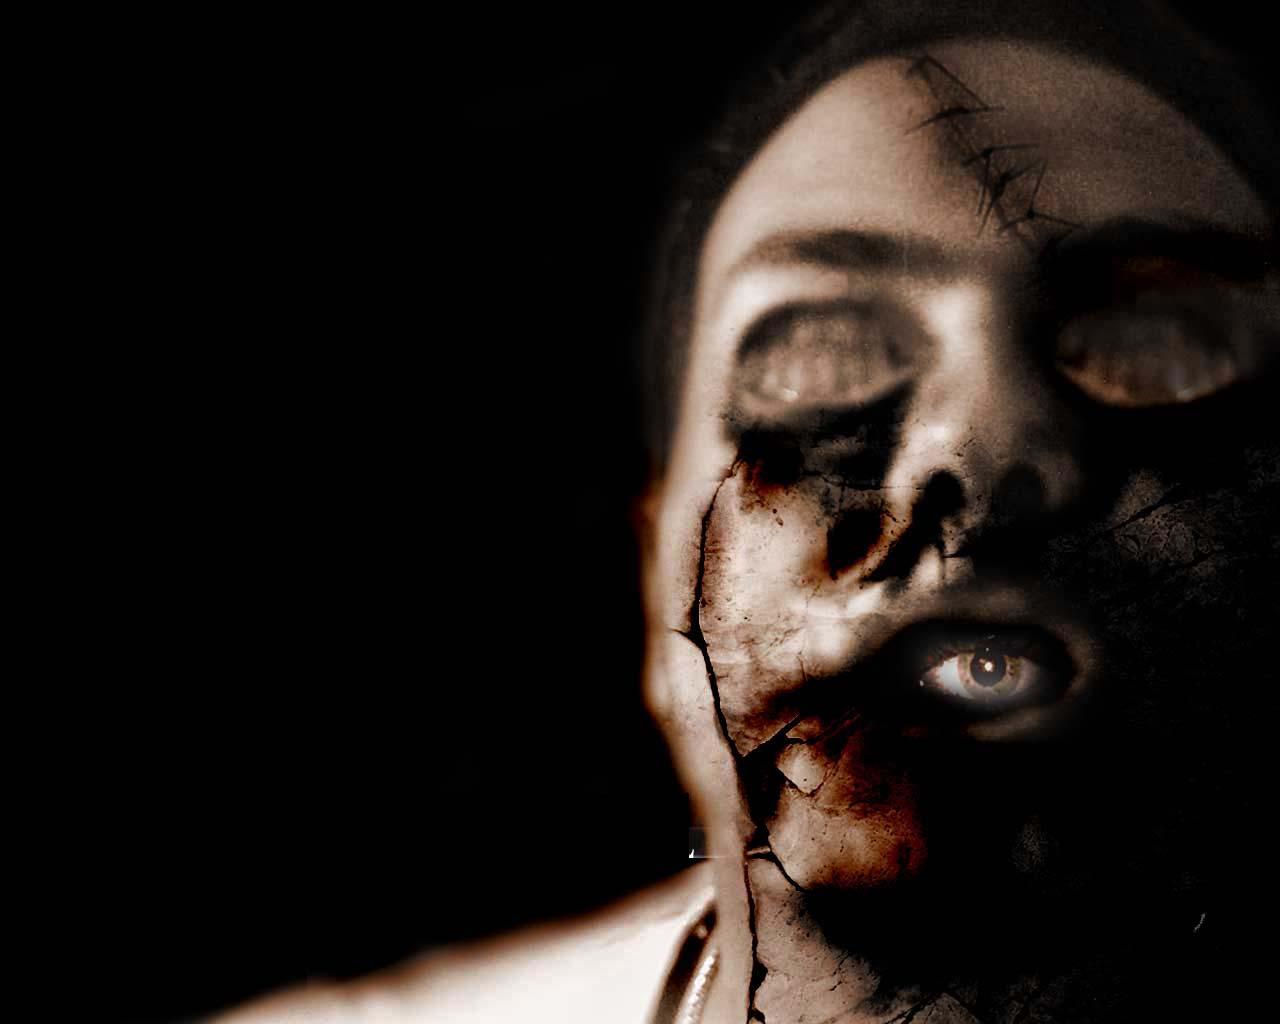 Horror wallpapers, horror wallpaper | Amazing Wallpapers